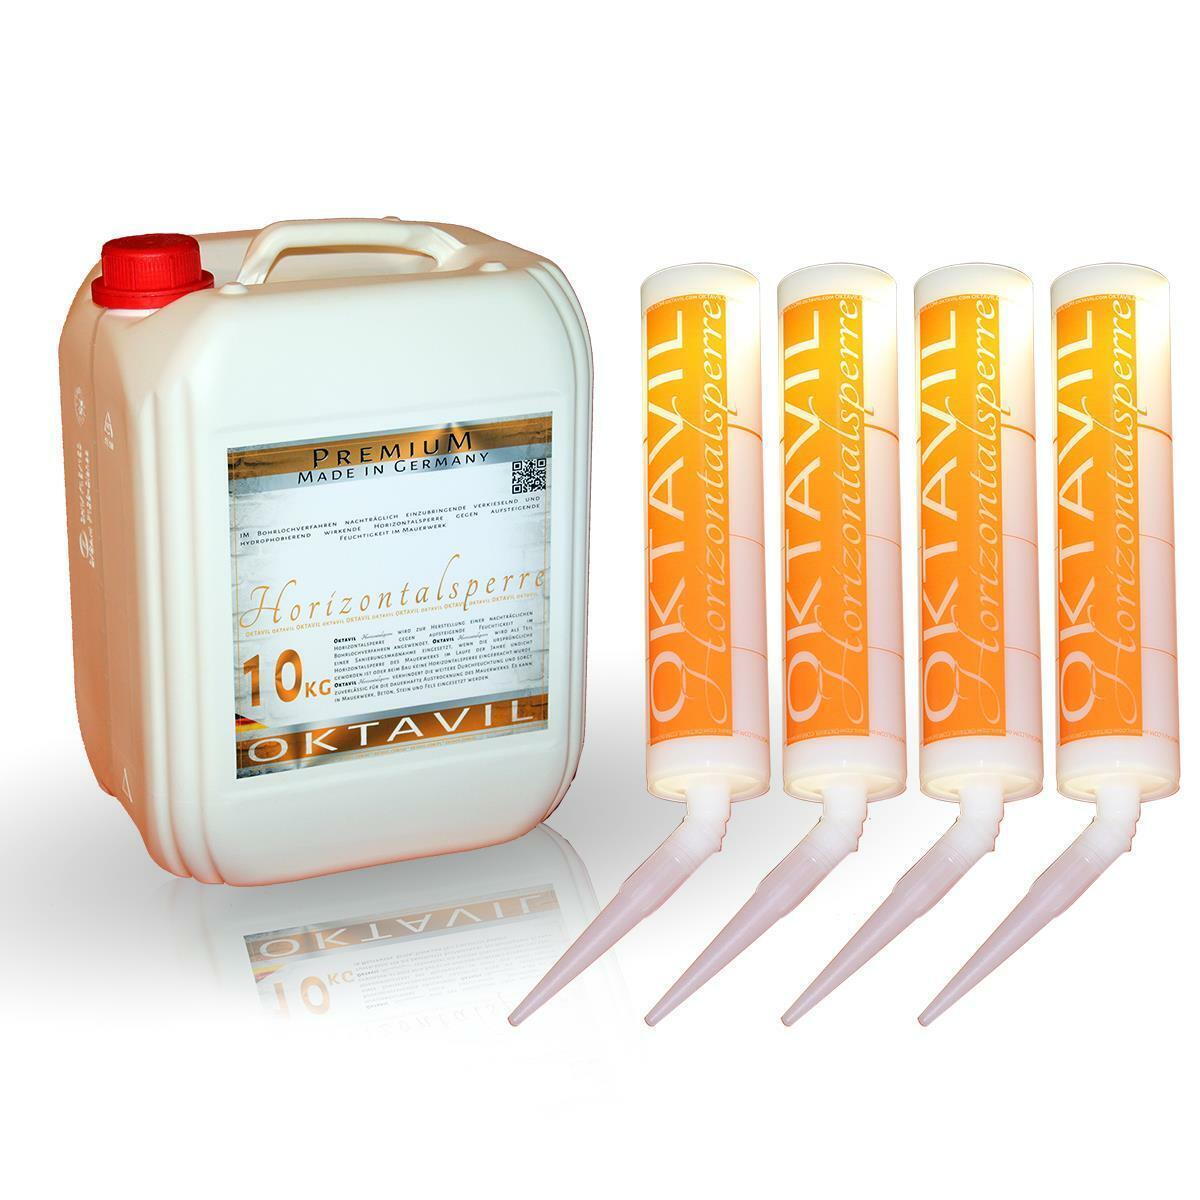 Oktavil Horizontalsperre - Premium - 40 Kilo plus 48 Oktavil Injektionstrichter